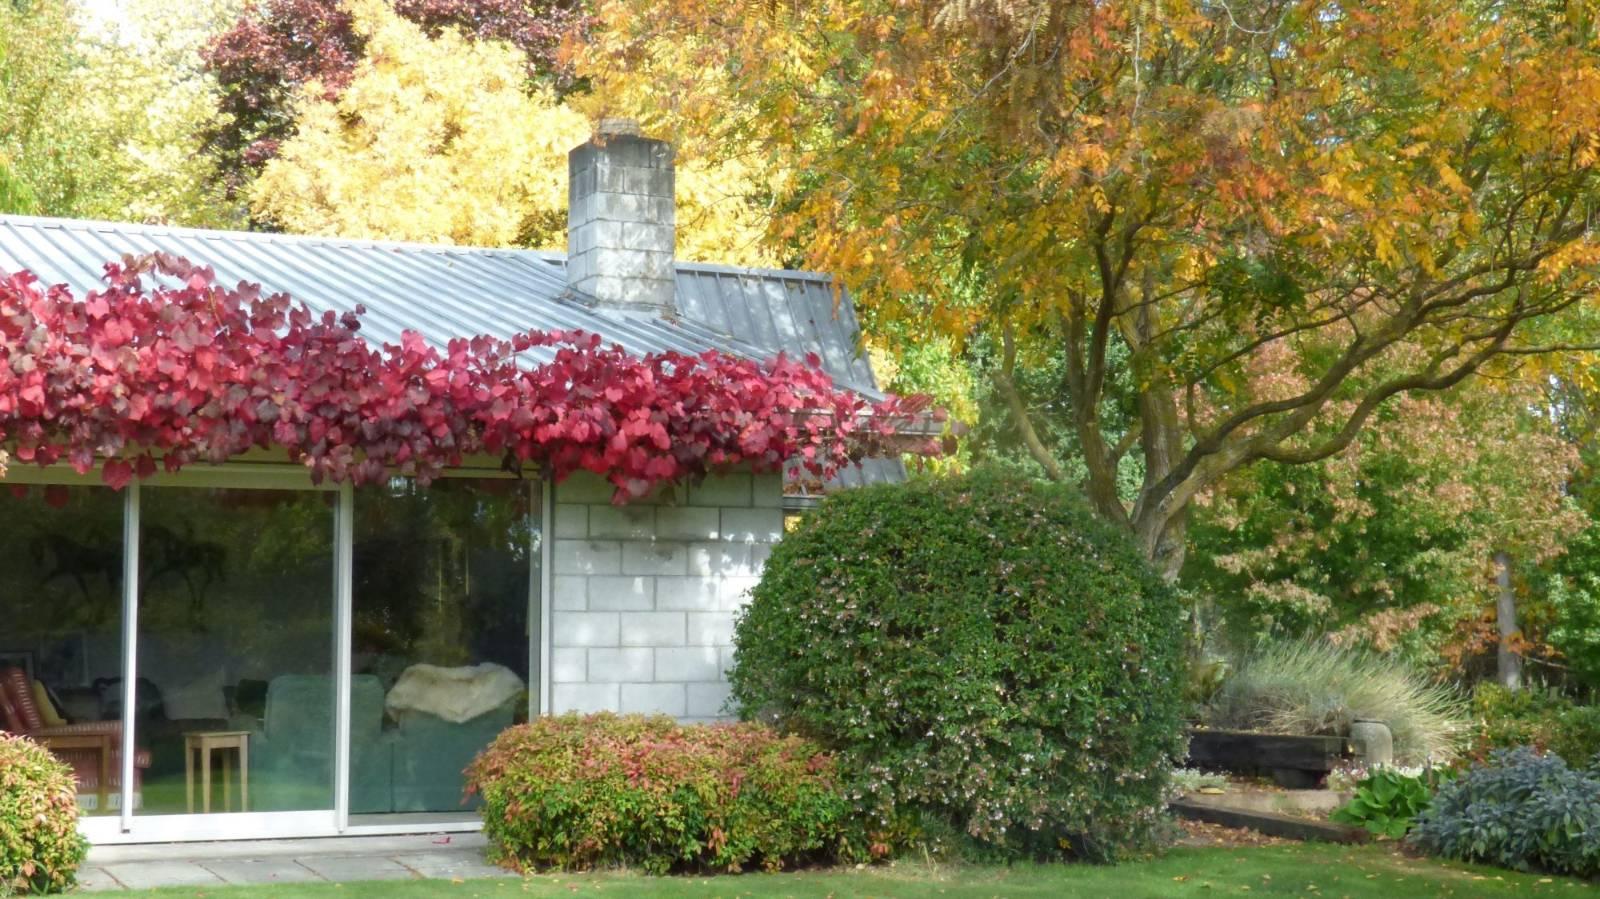 Step inside a centuries-old garden in full autumn bloom